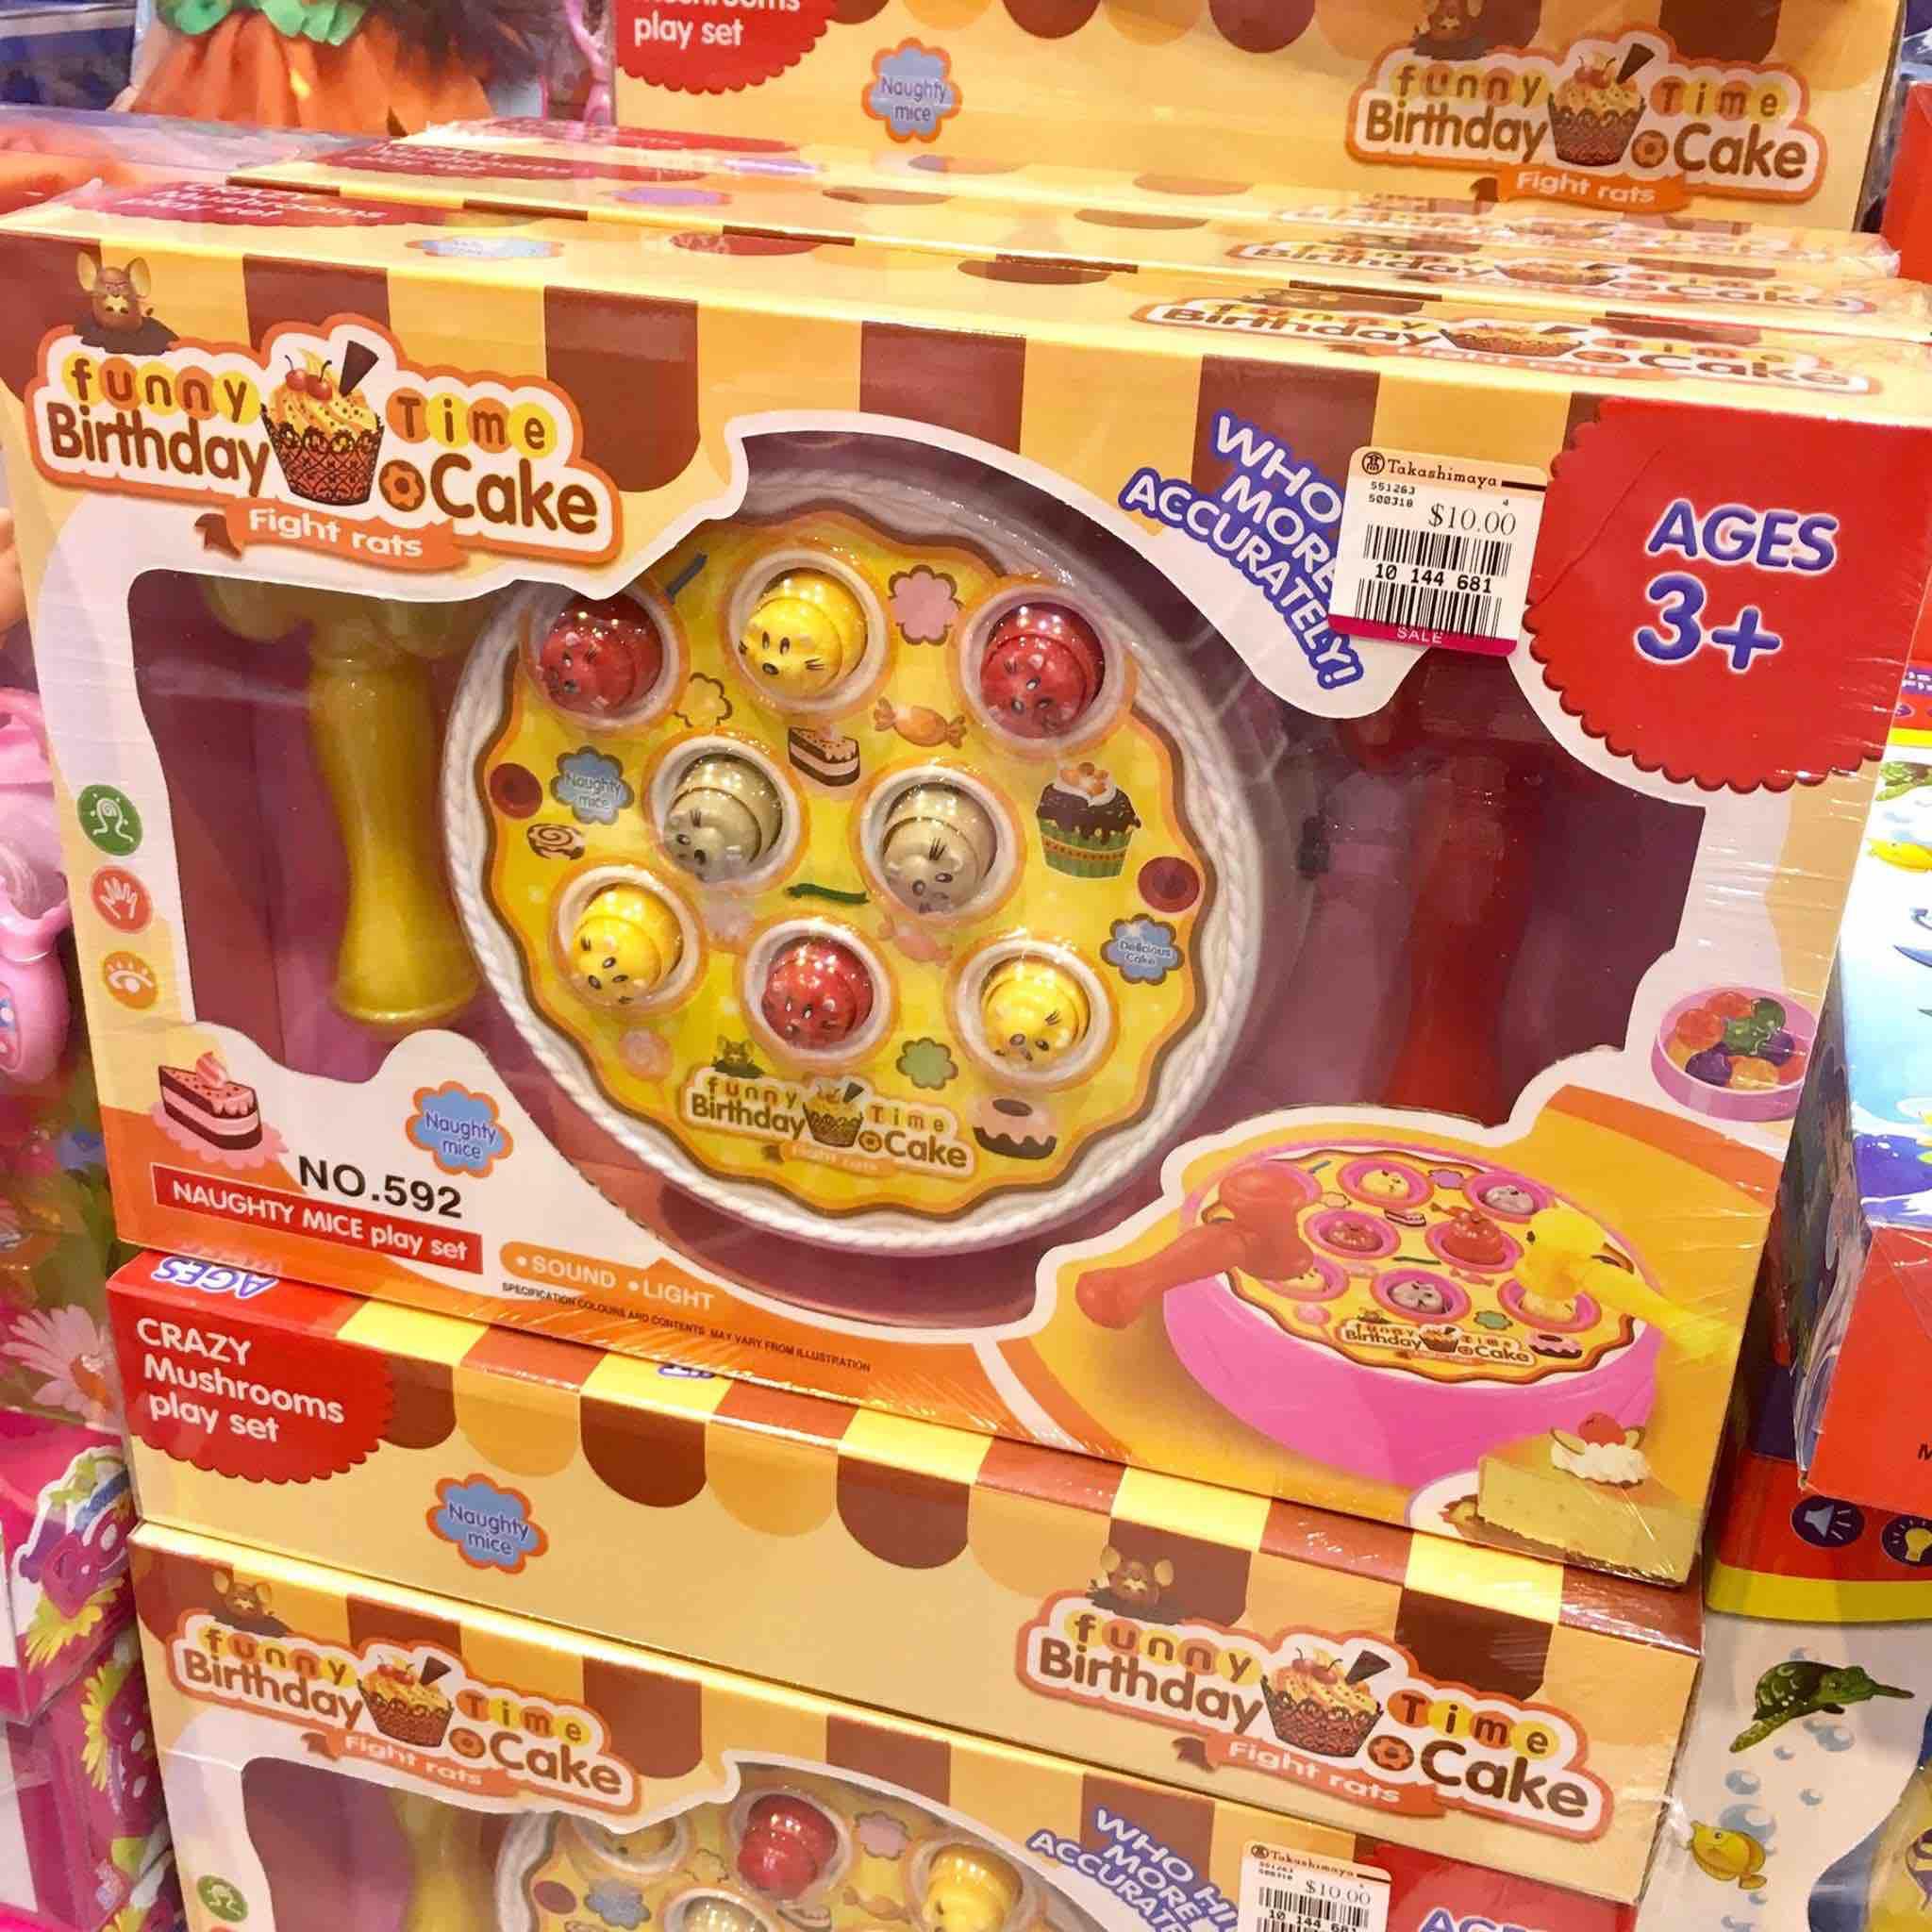 Takashimaya Singapore 21st Craziest Toys Sale Promotion 28 Jul - 6 Aug 2017   Why Not Deals 12 & Promotions